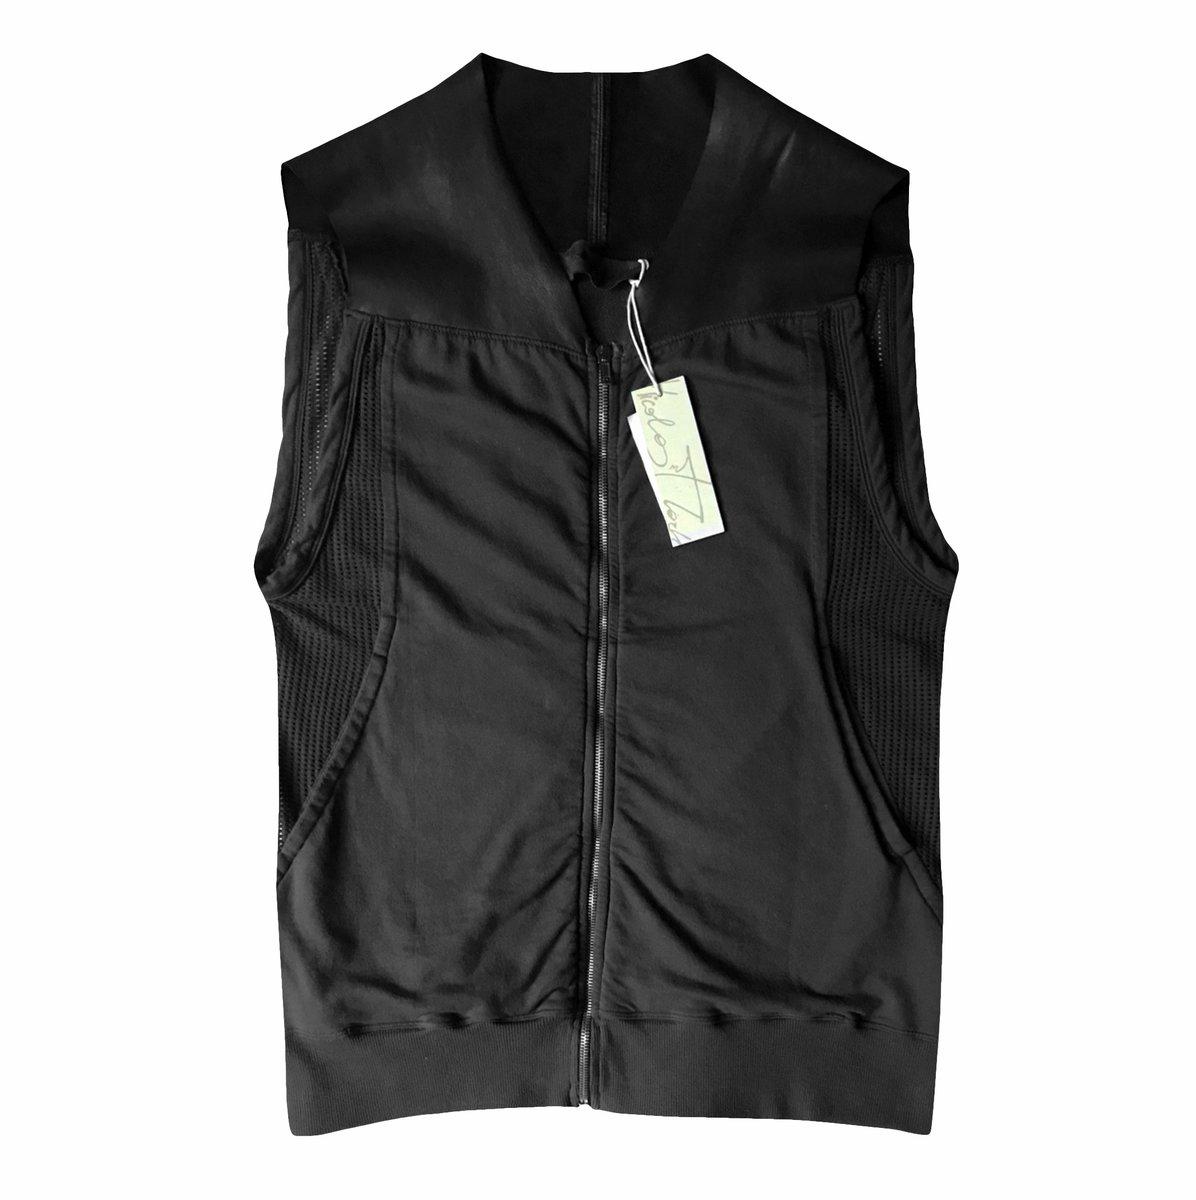 nicolas mark leather mesh vest.jpg